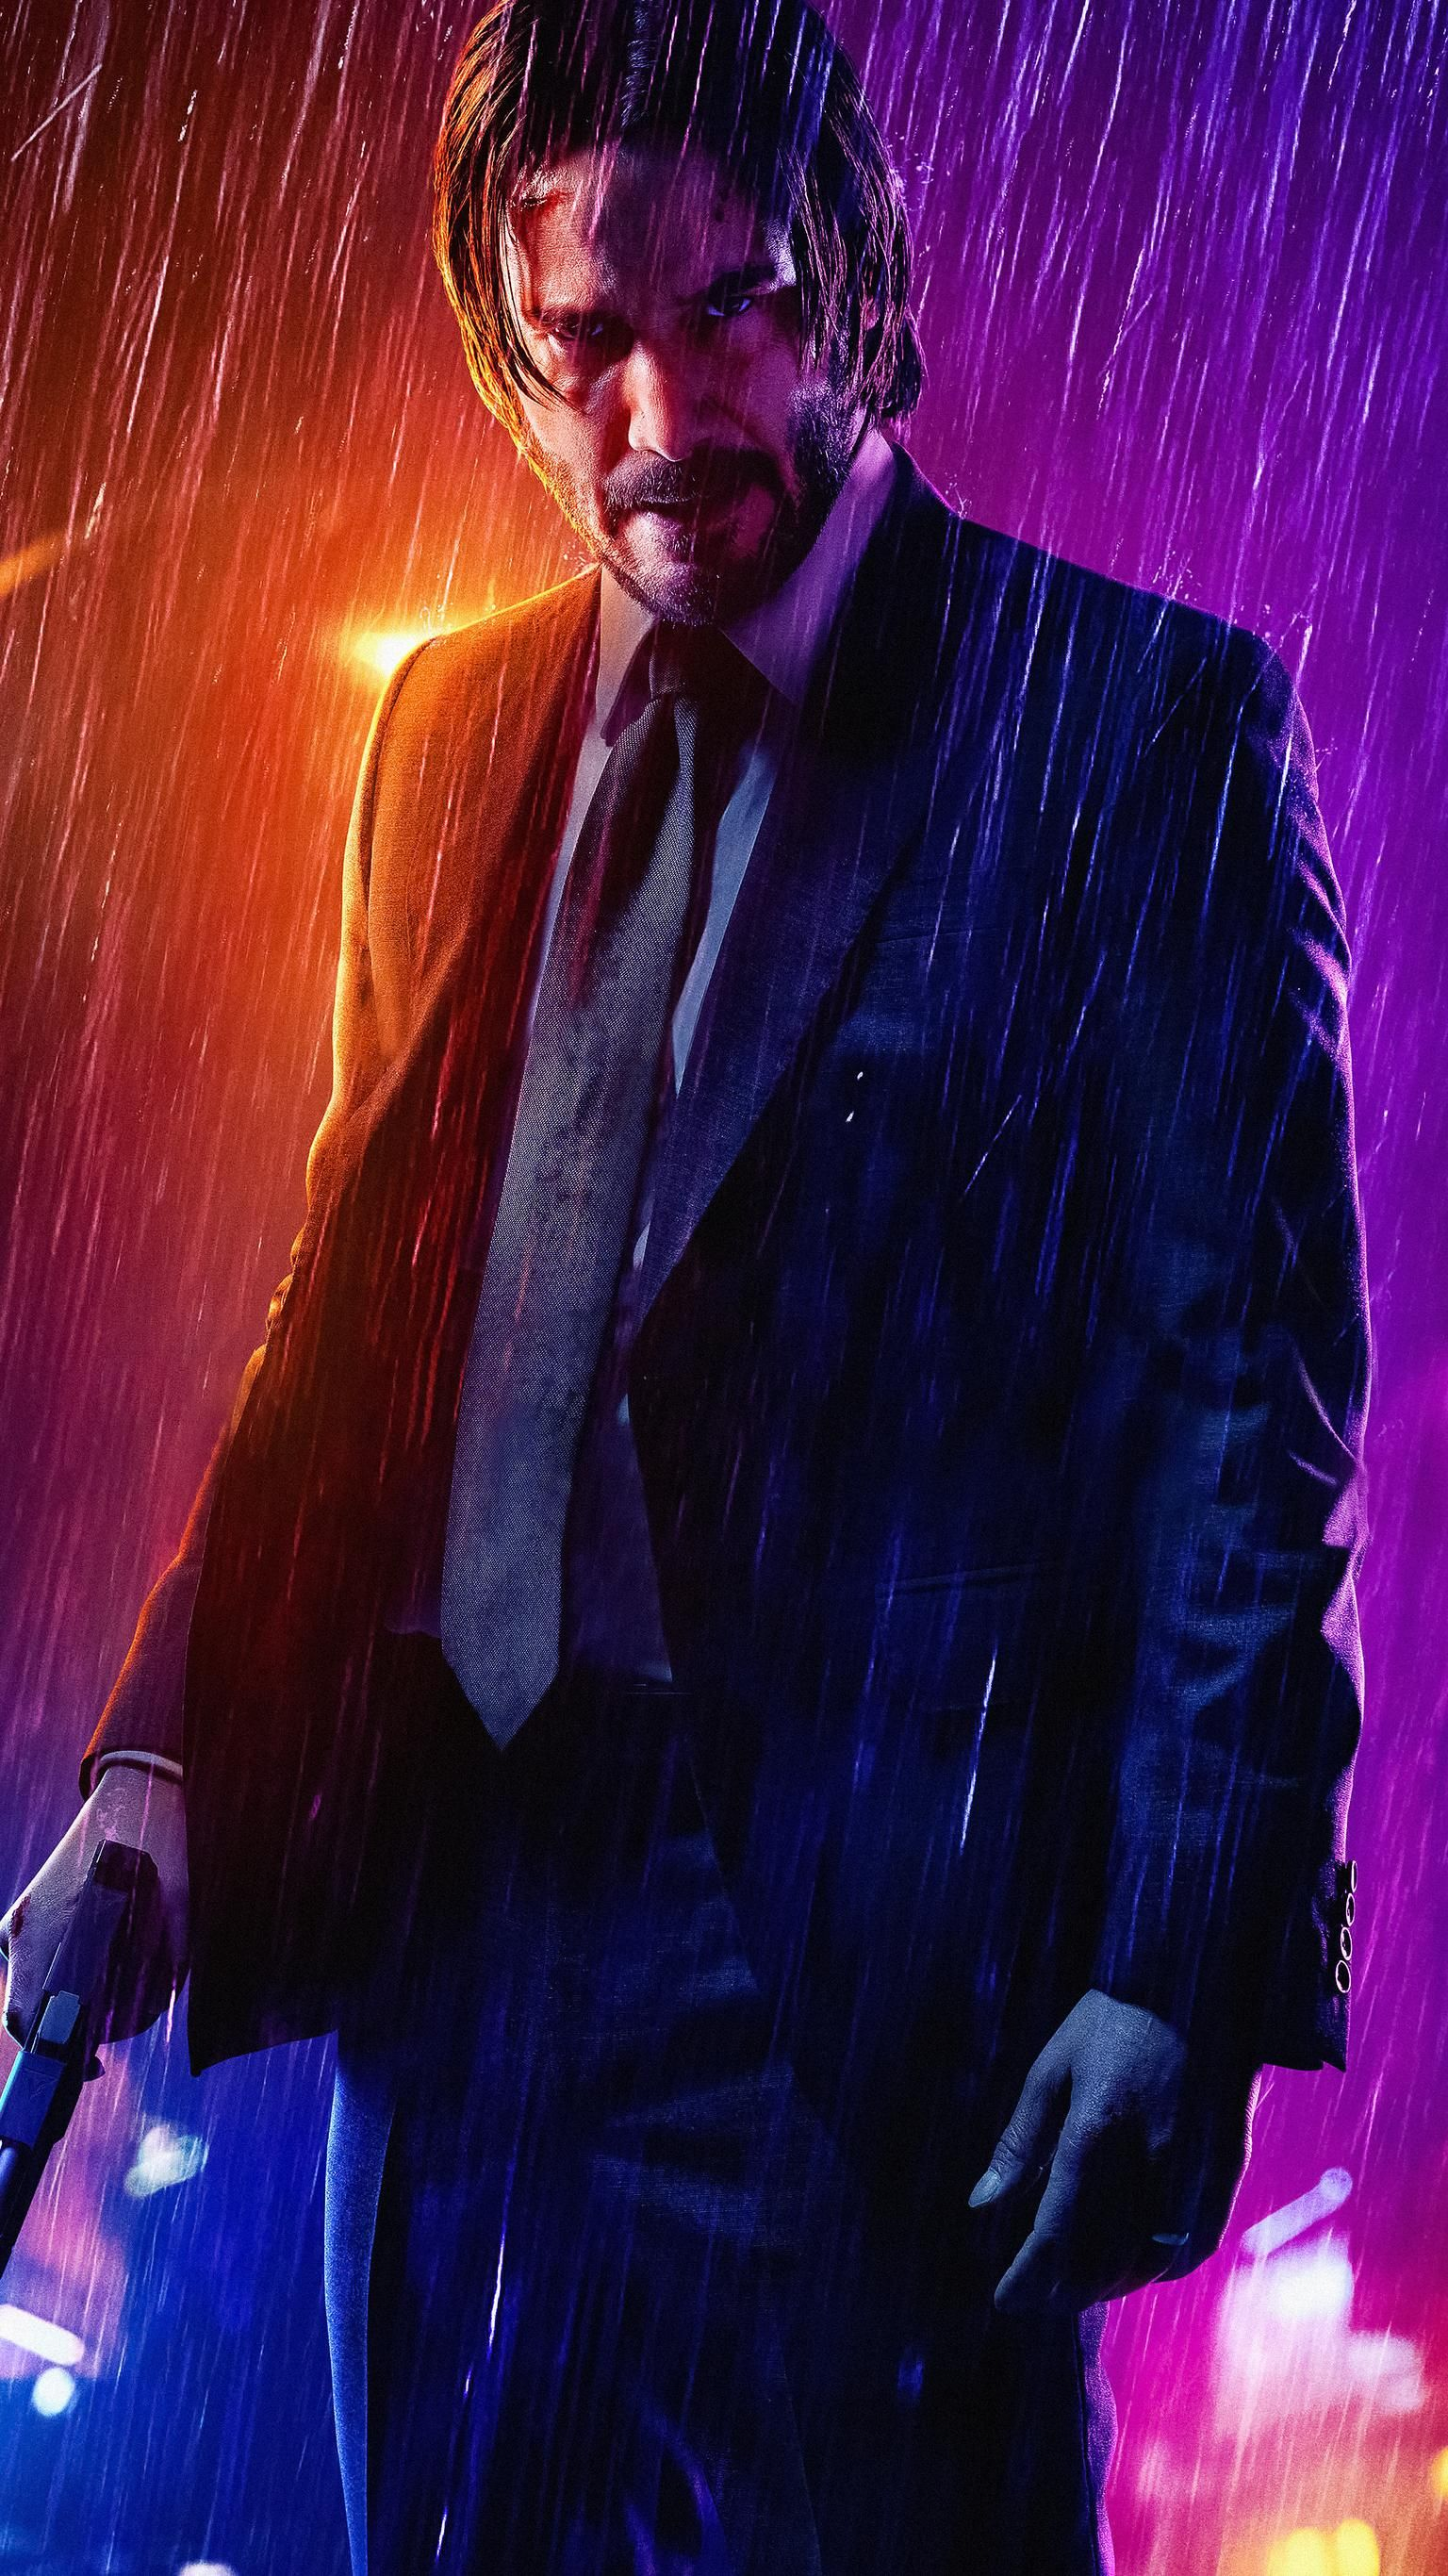 John Wick: Chapter 3 - Parabellum (2019) Phone Wallpaper | Moviemania